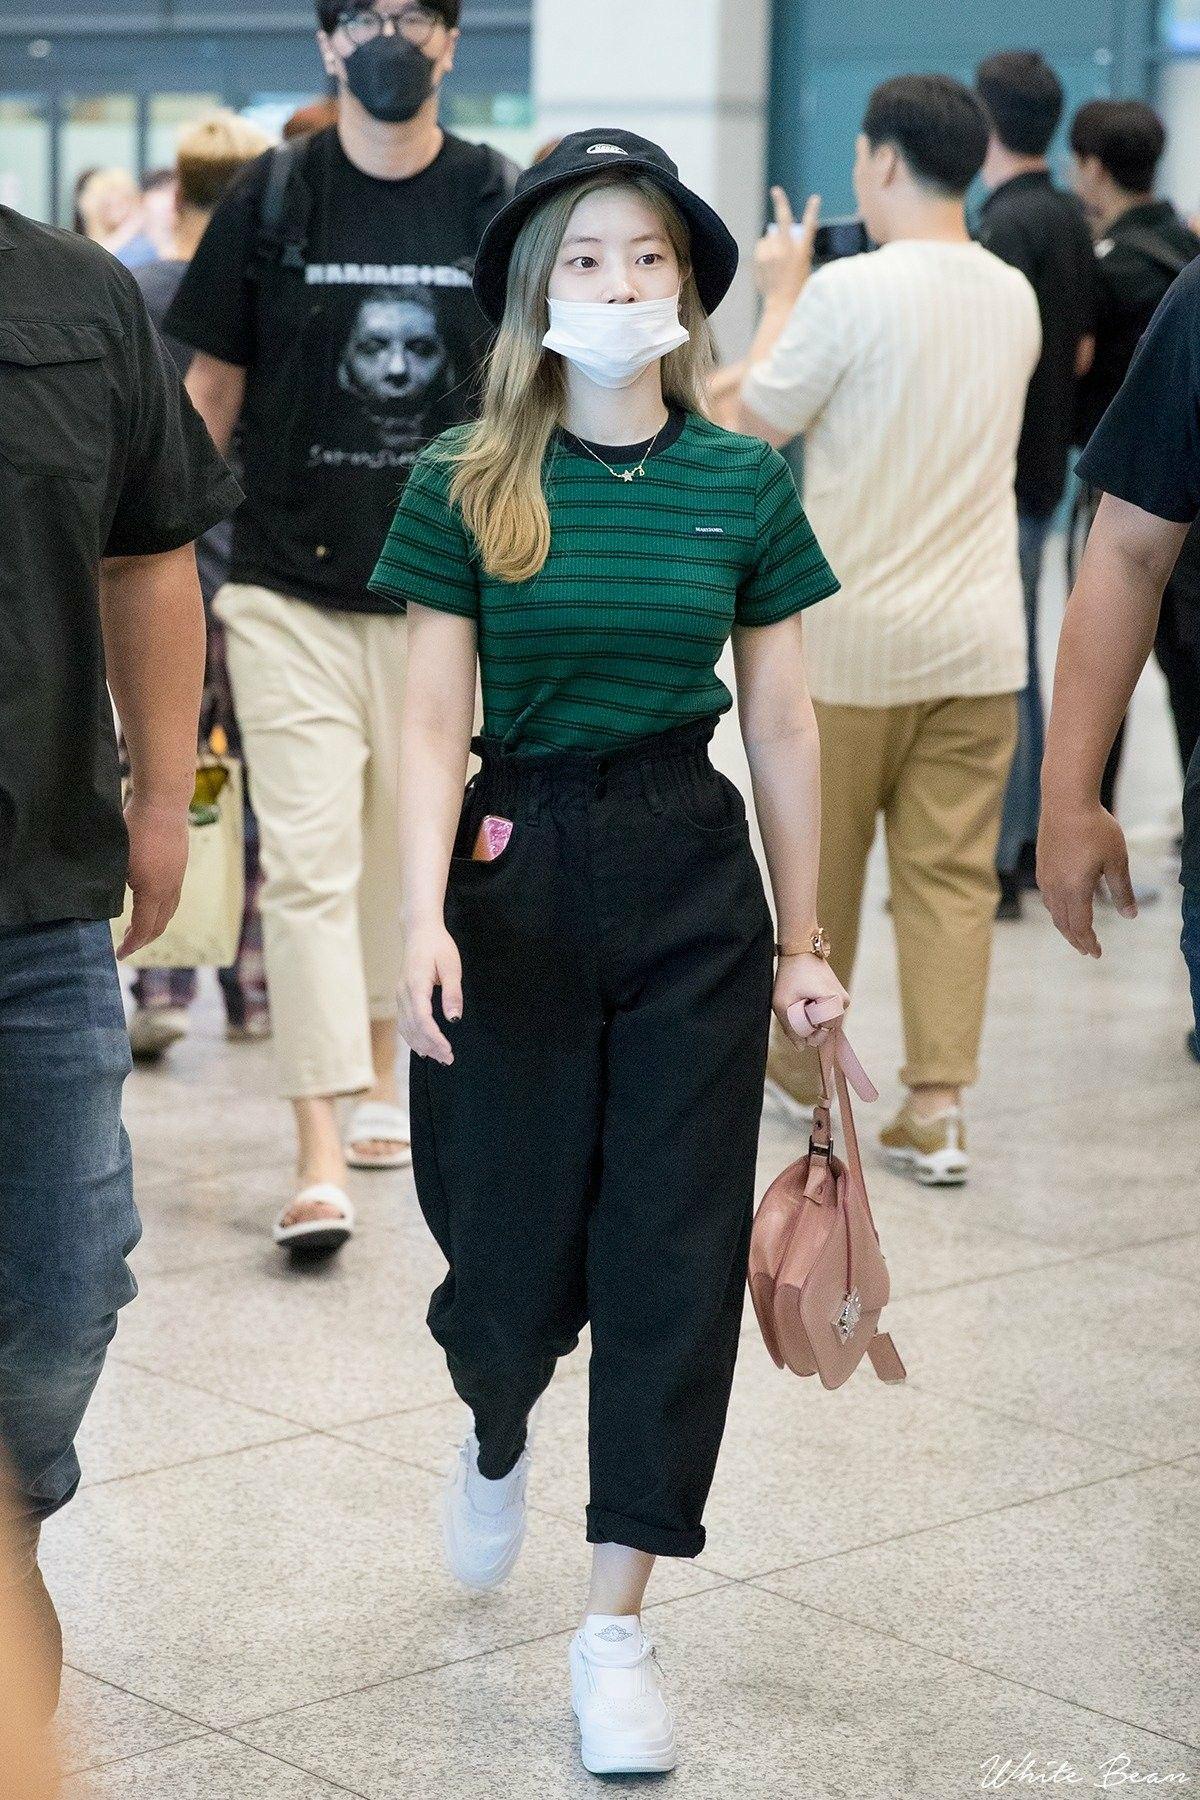 Dahyun Twice Korean Airport Fashion Kpop Fashion Outfits Airport Fashion Kpop